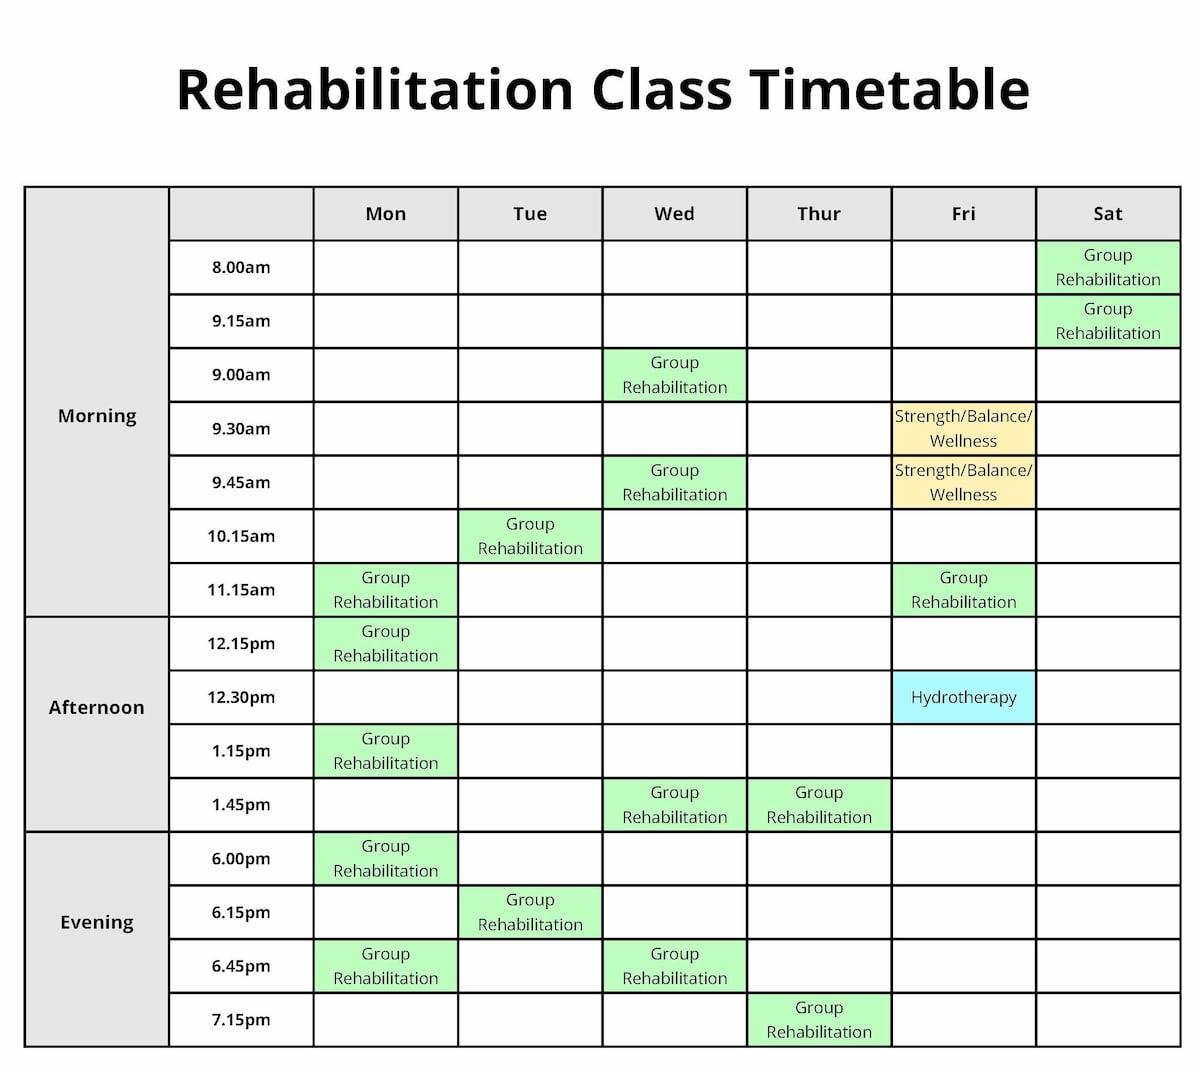 Rehab Class Timetable 2019